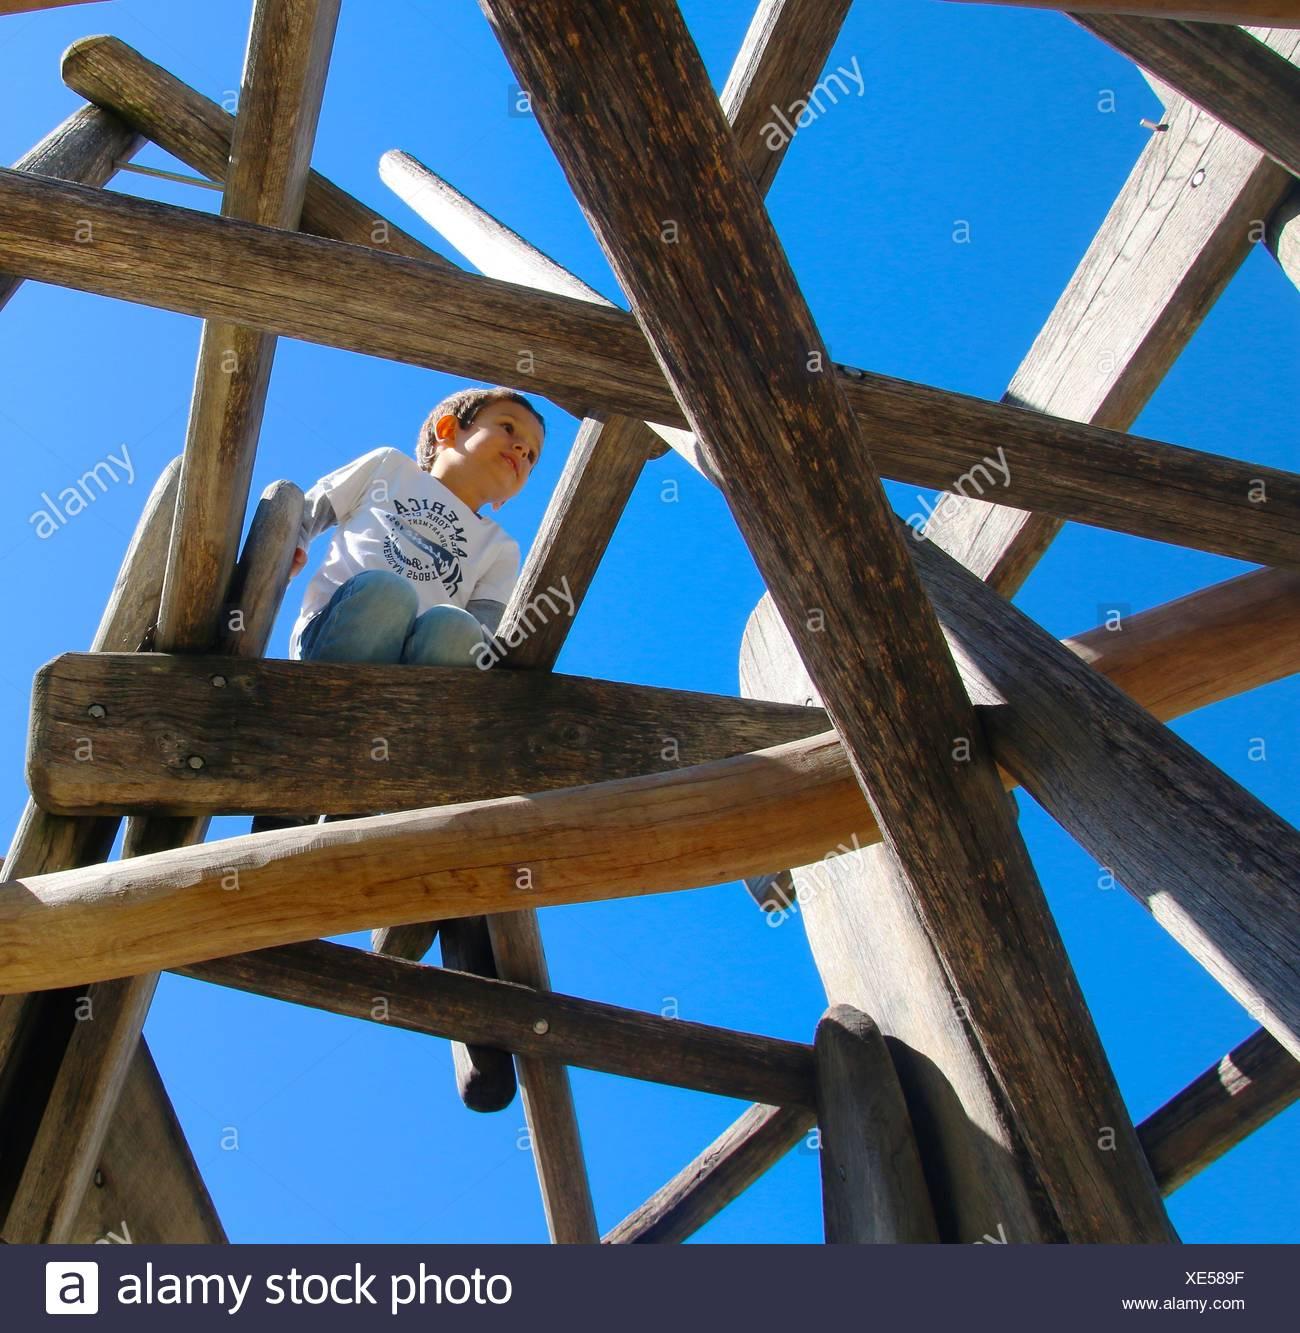 Italy, Trentino-Alto Adige, Alto Adige, Bolzano, Low angle view of boy (4-5) playing on wooden playground - Stock Image